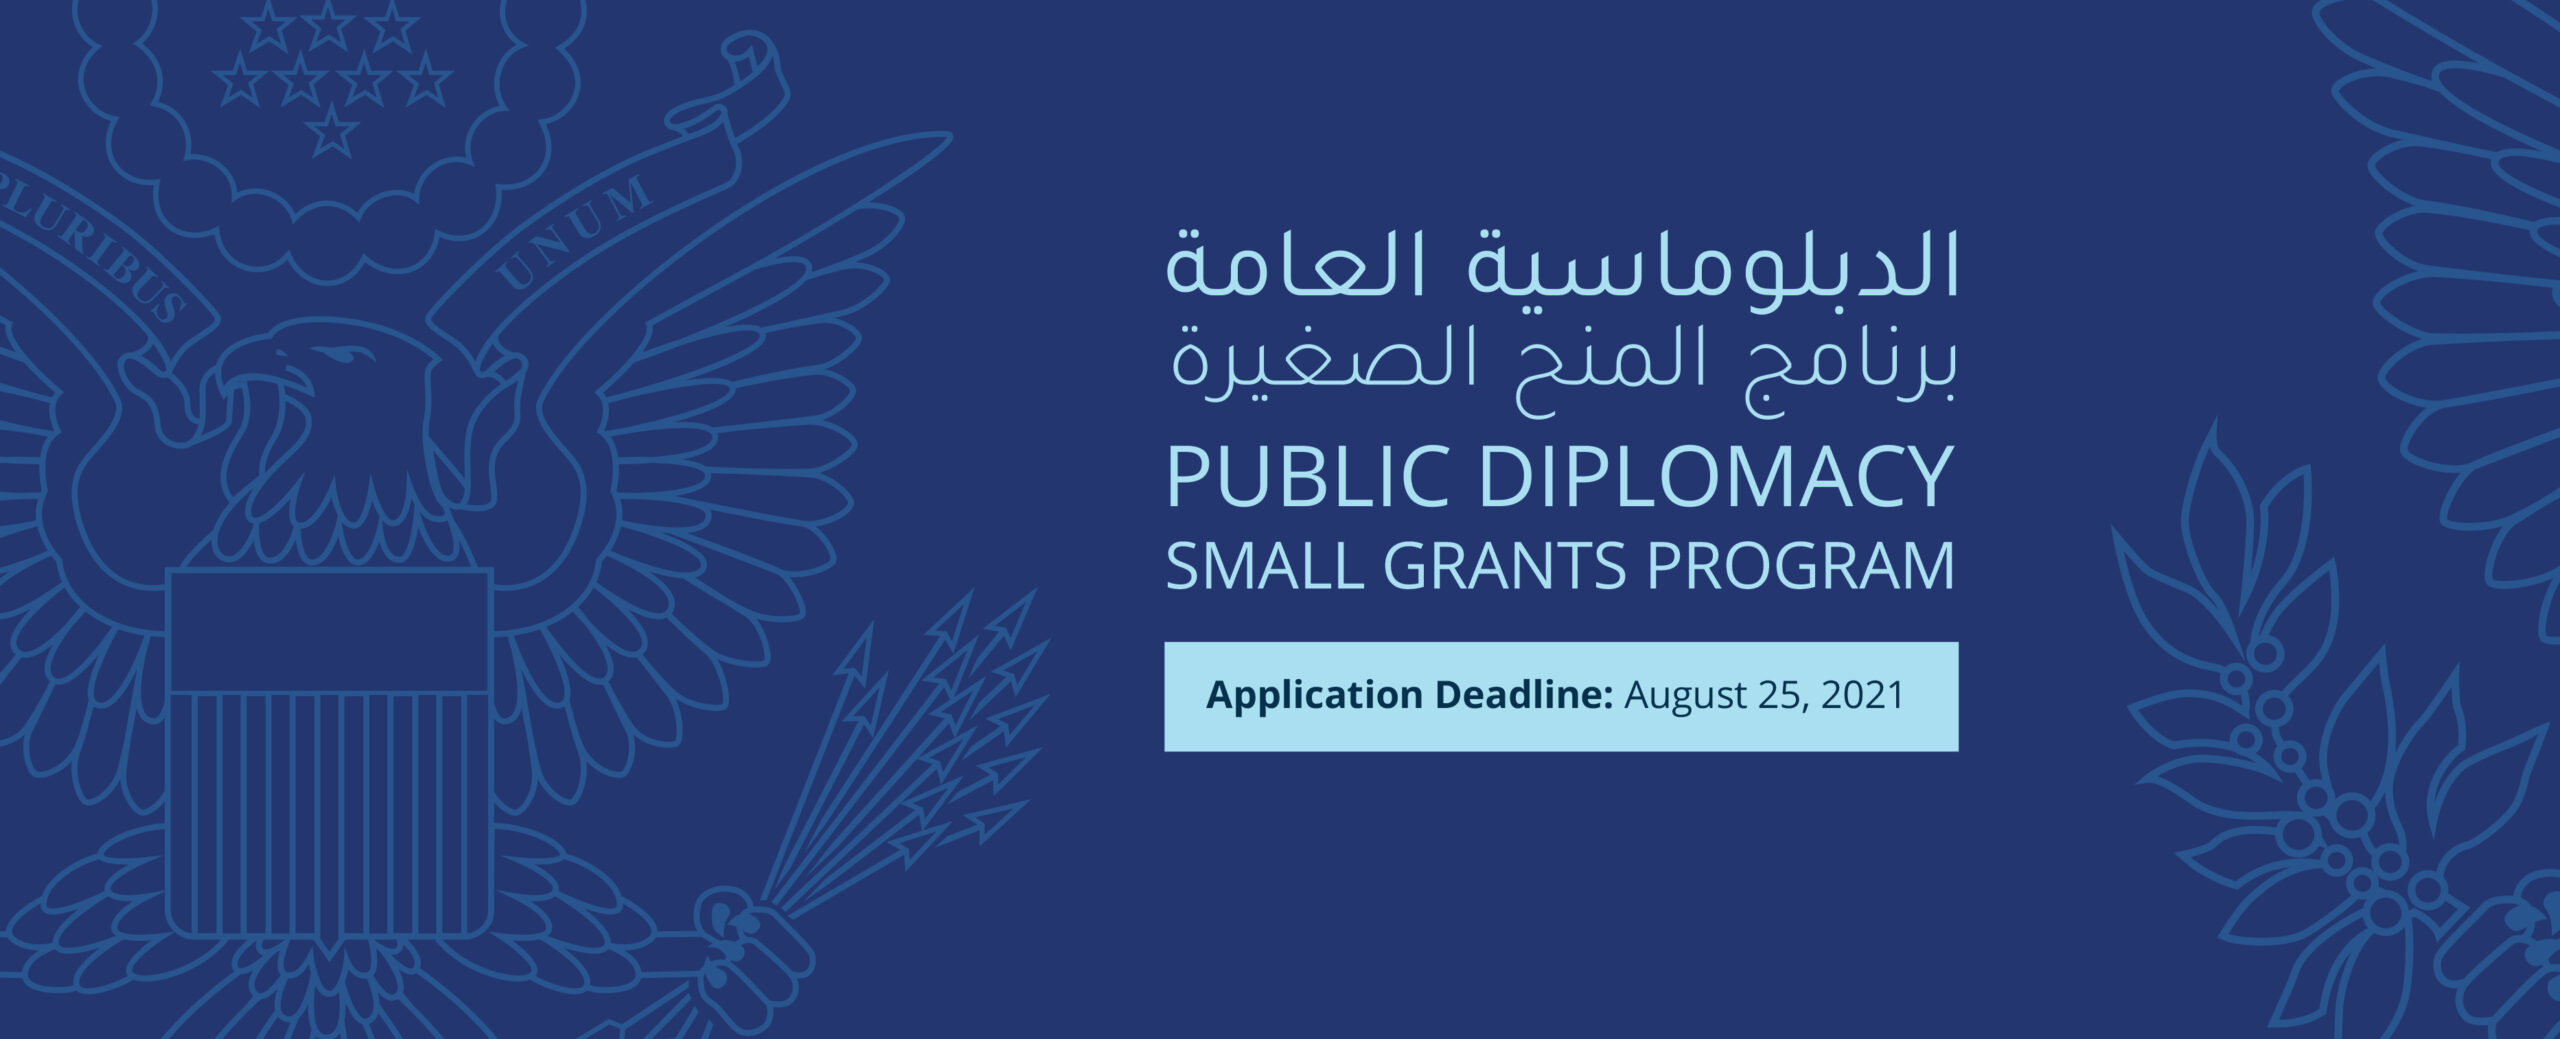 Public diplomacy small grants